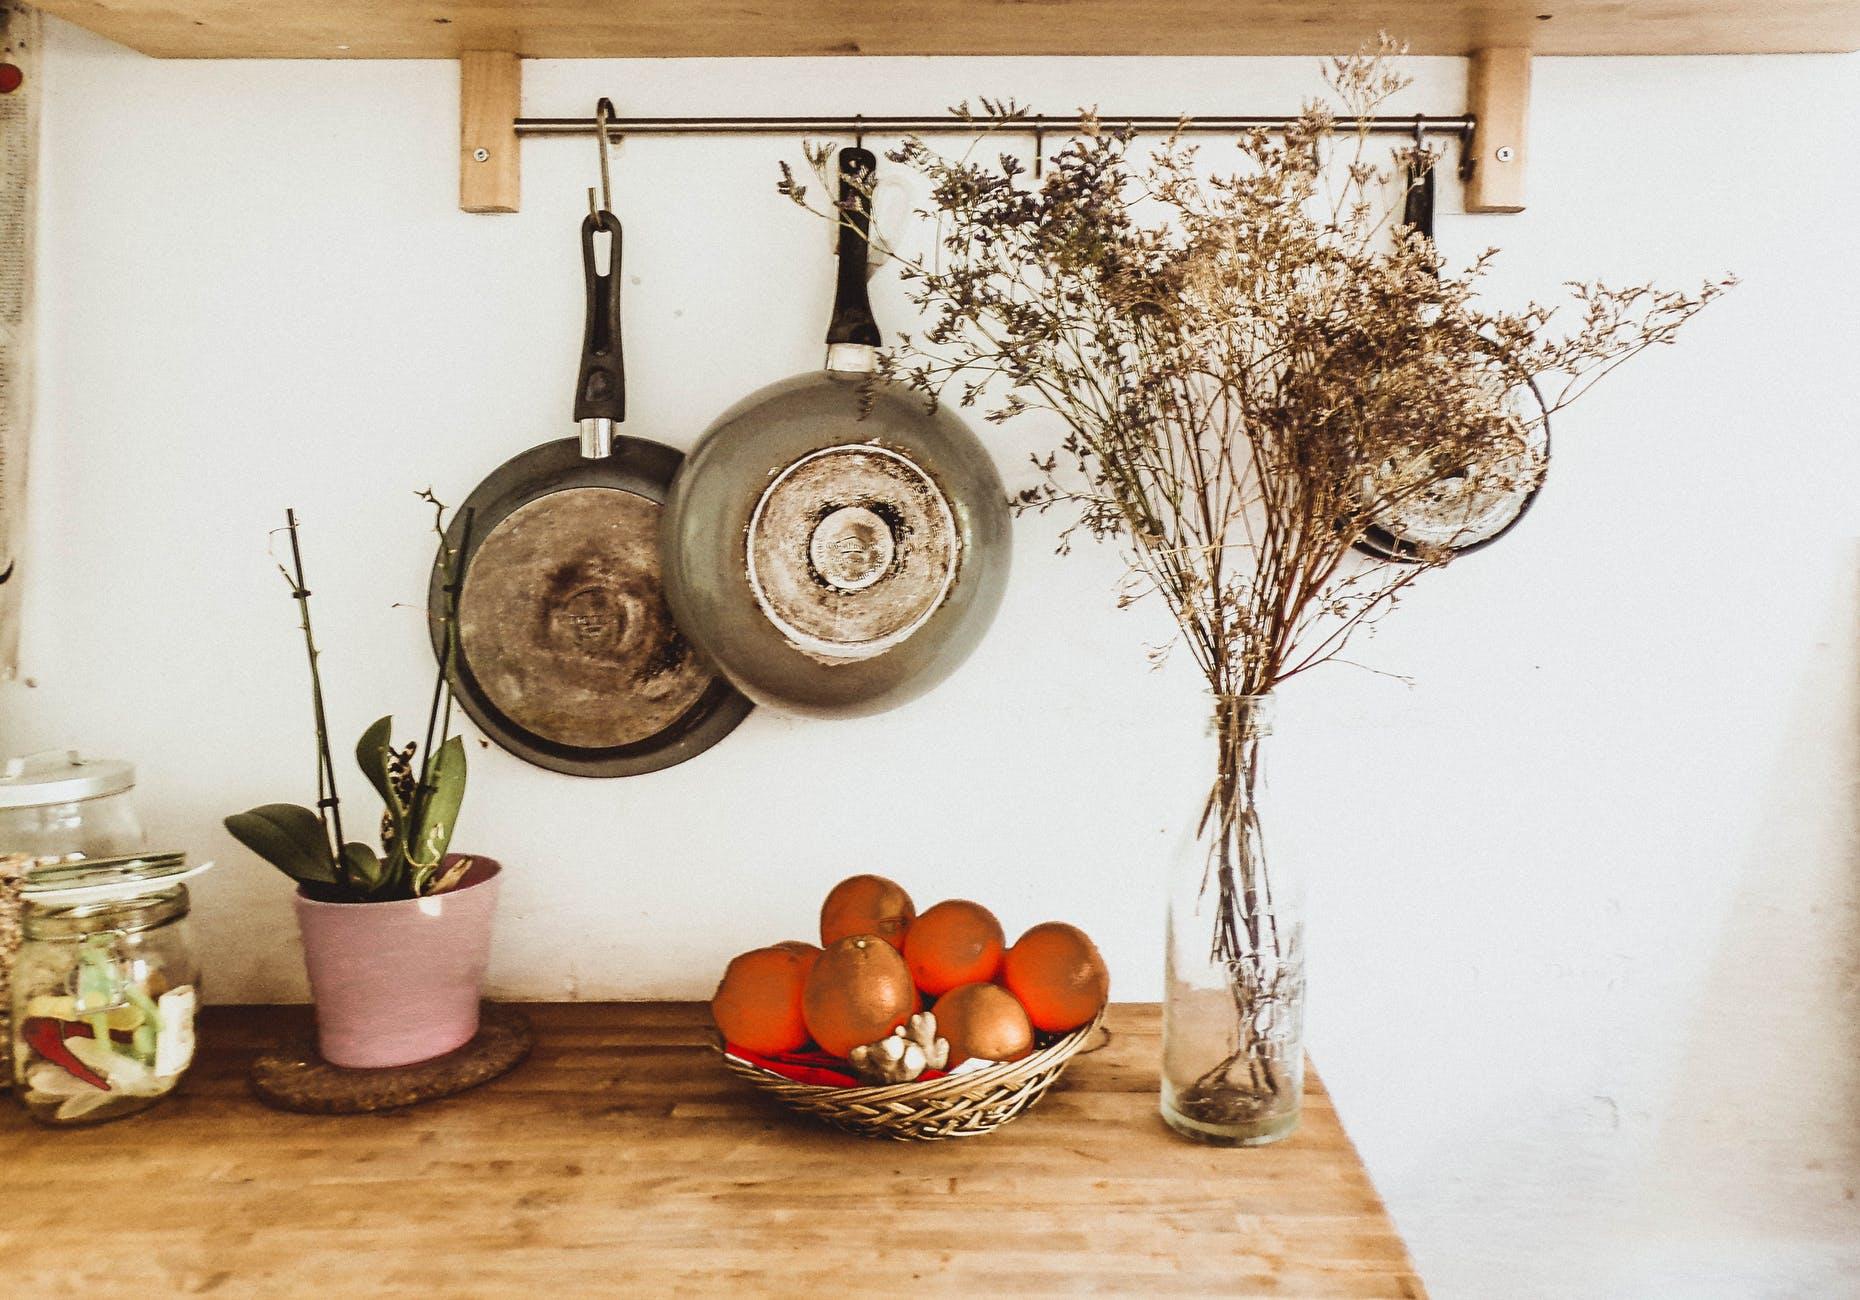 Stile rustico per arredare la cucina ambiente caldo ed accogliente